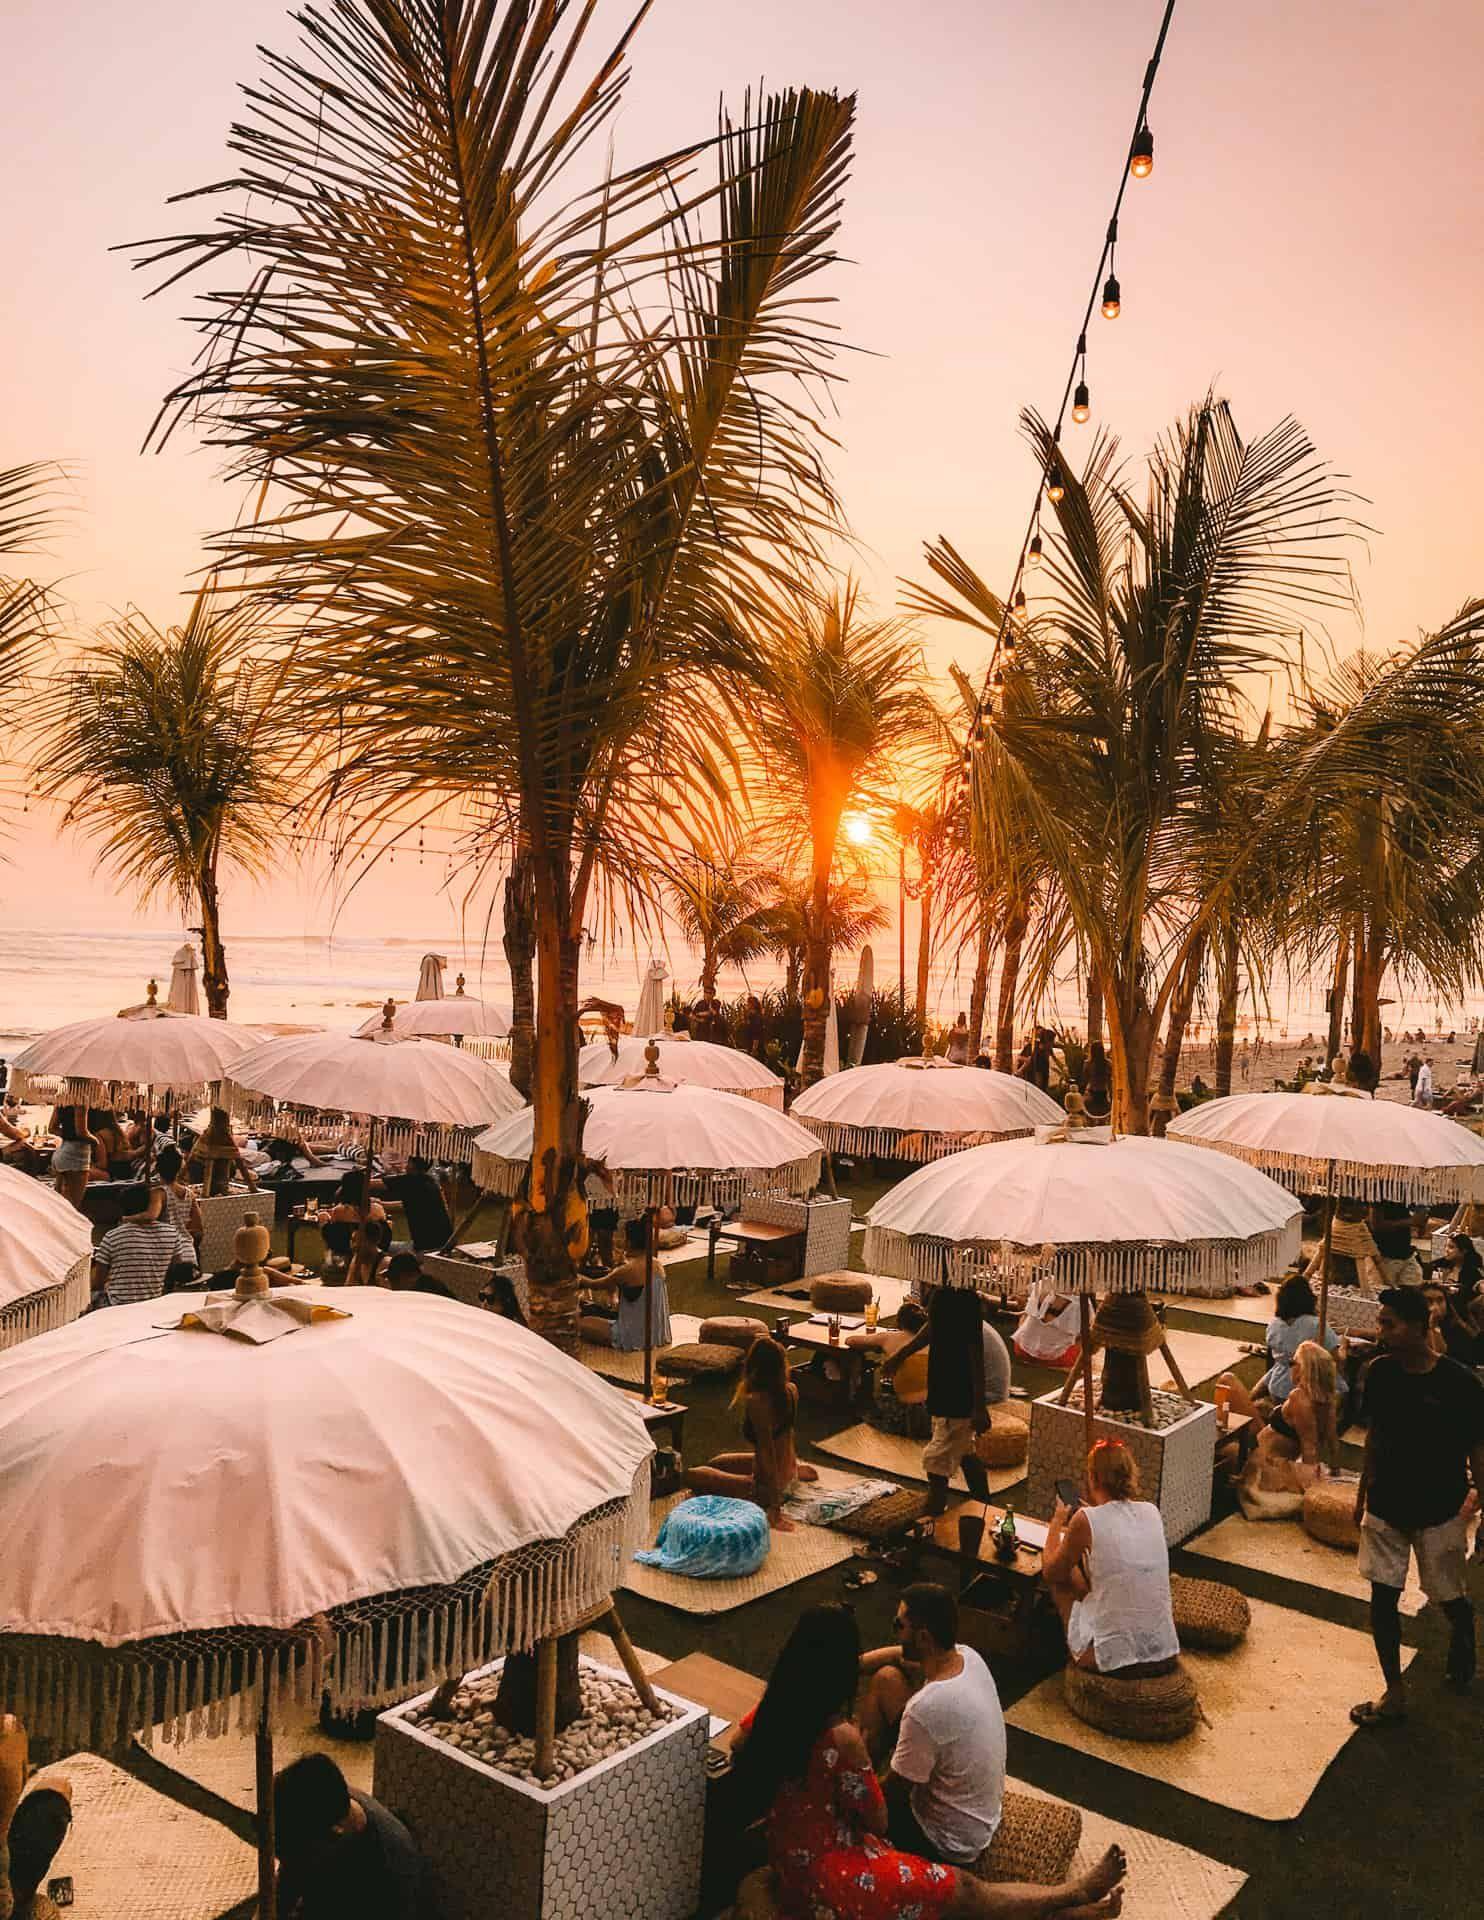 13 X Things To Do In Canggu Bali The Full Guide Bali Beaches Canggu Beach Canggu Bali